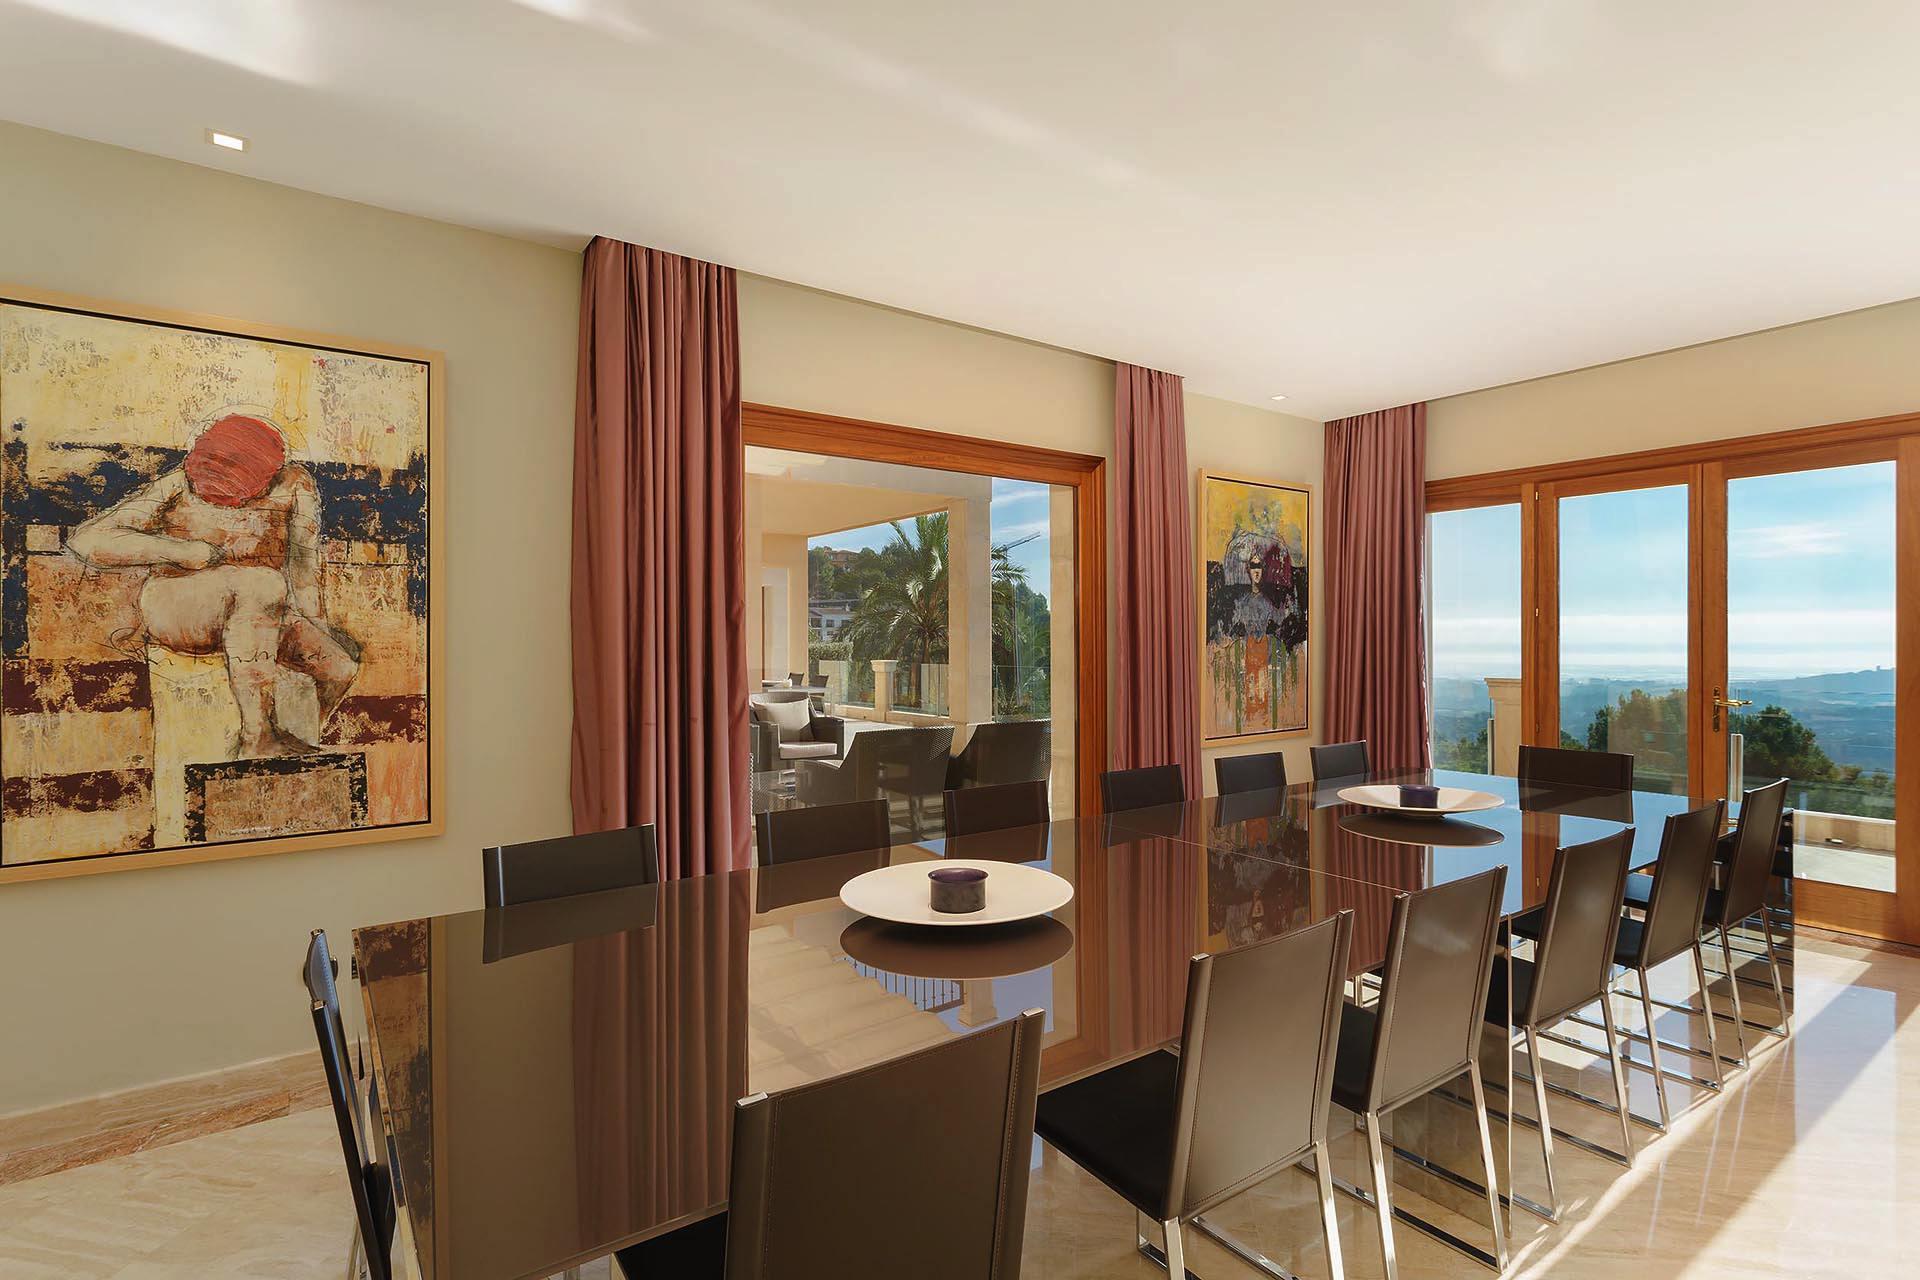 01-280 großzügige Villa nahe Palma de Mallorca Bild 24